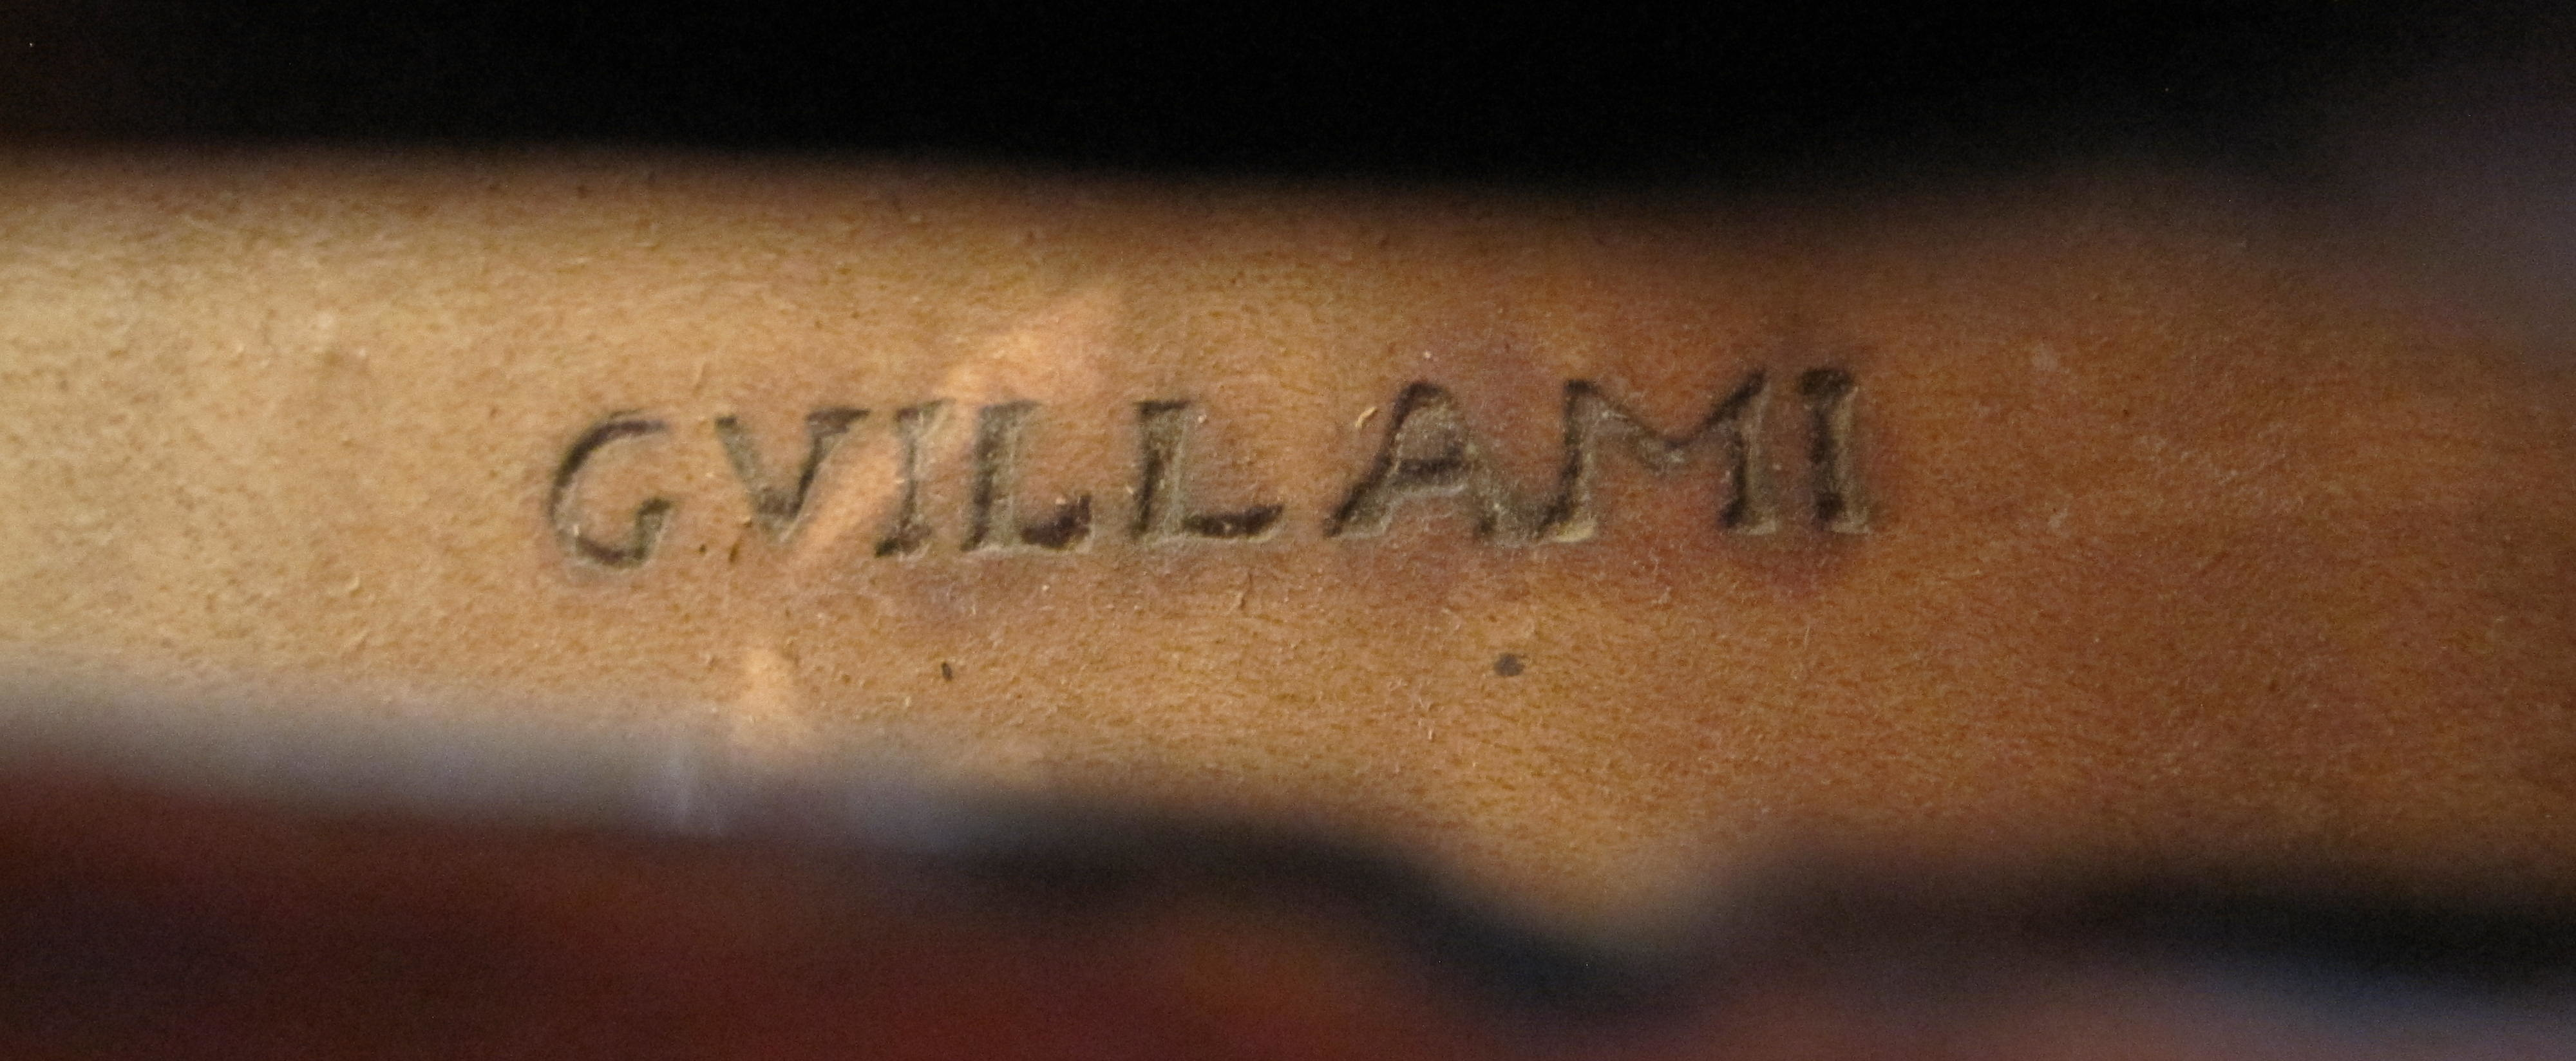 Guillami brand